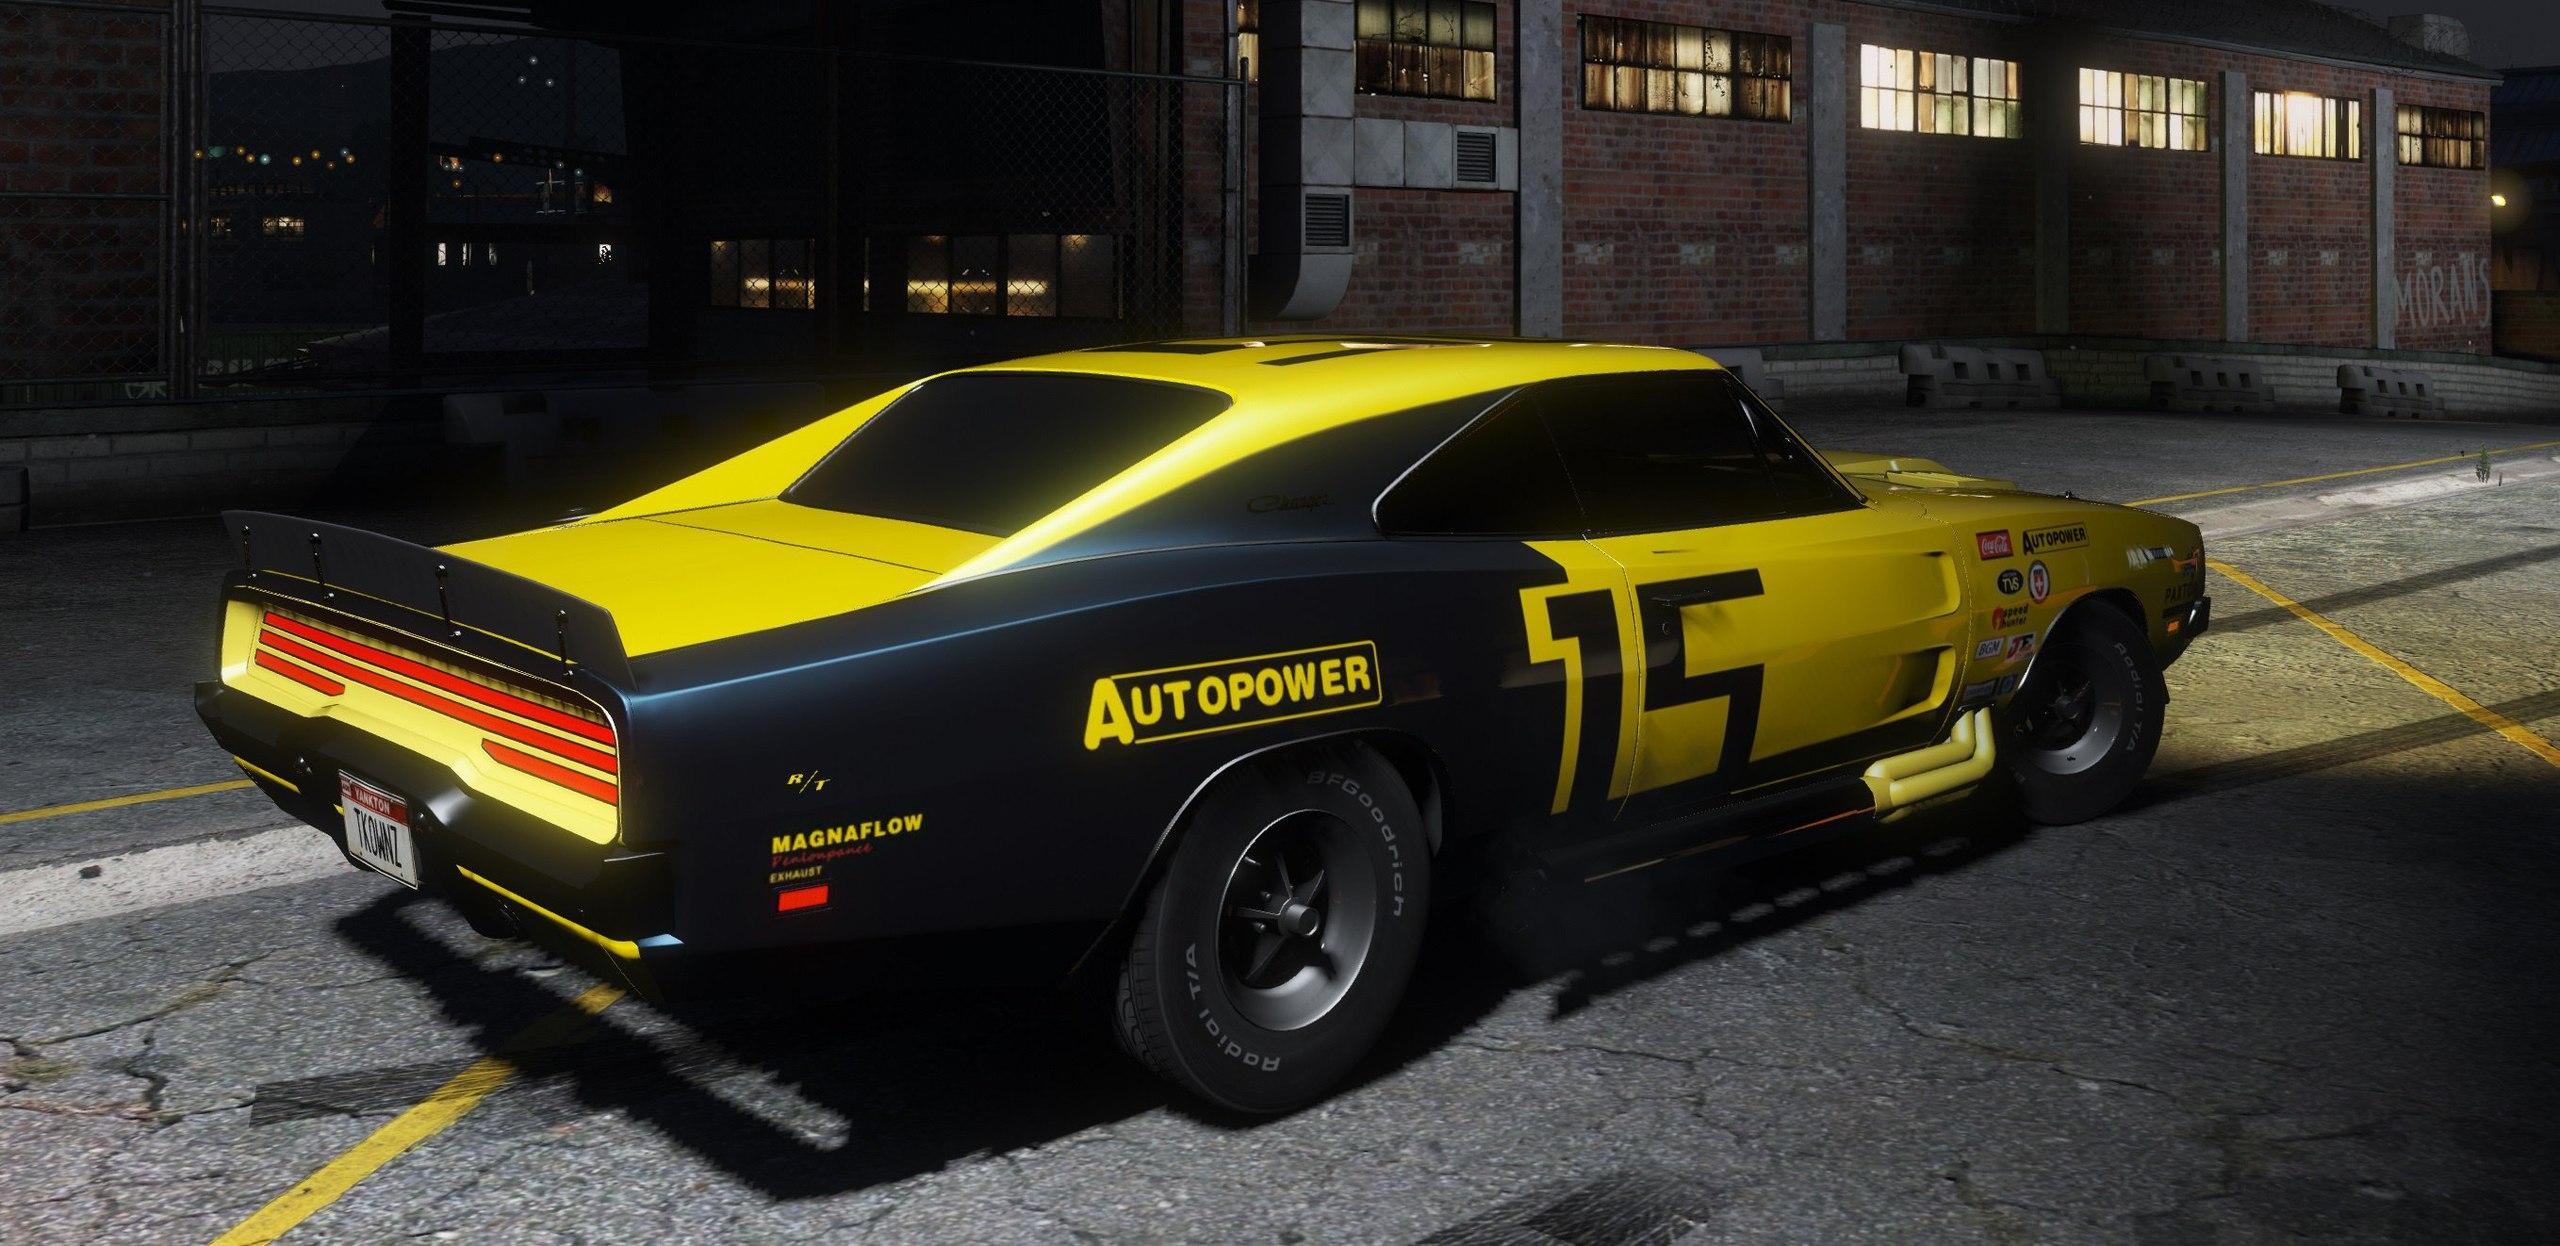 1969 Dodge Charger R/T для GTA V - Скриншот 1